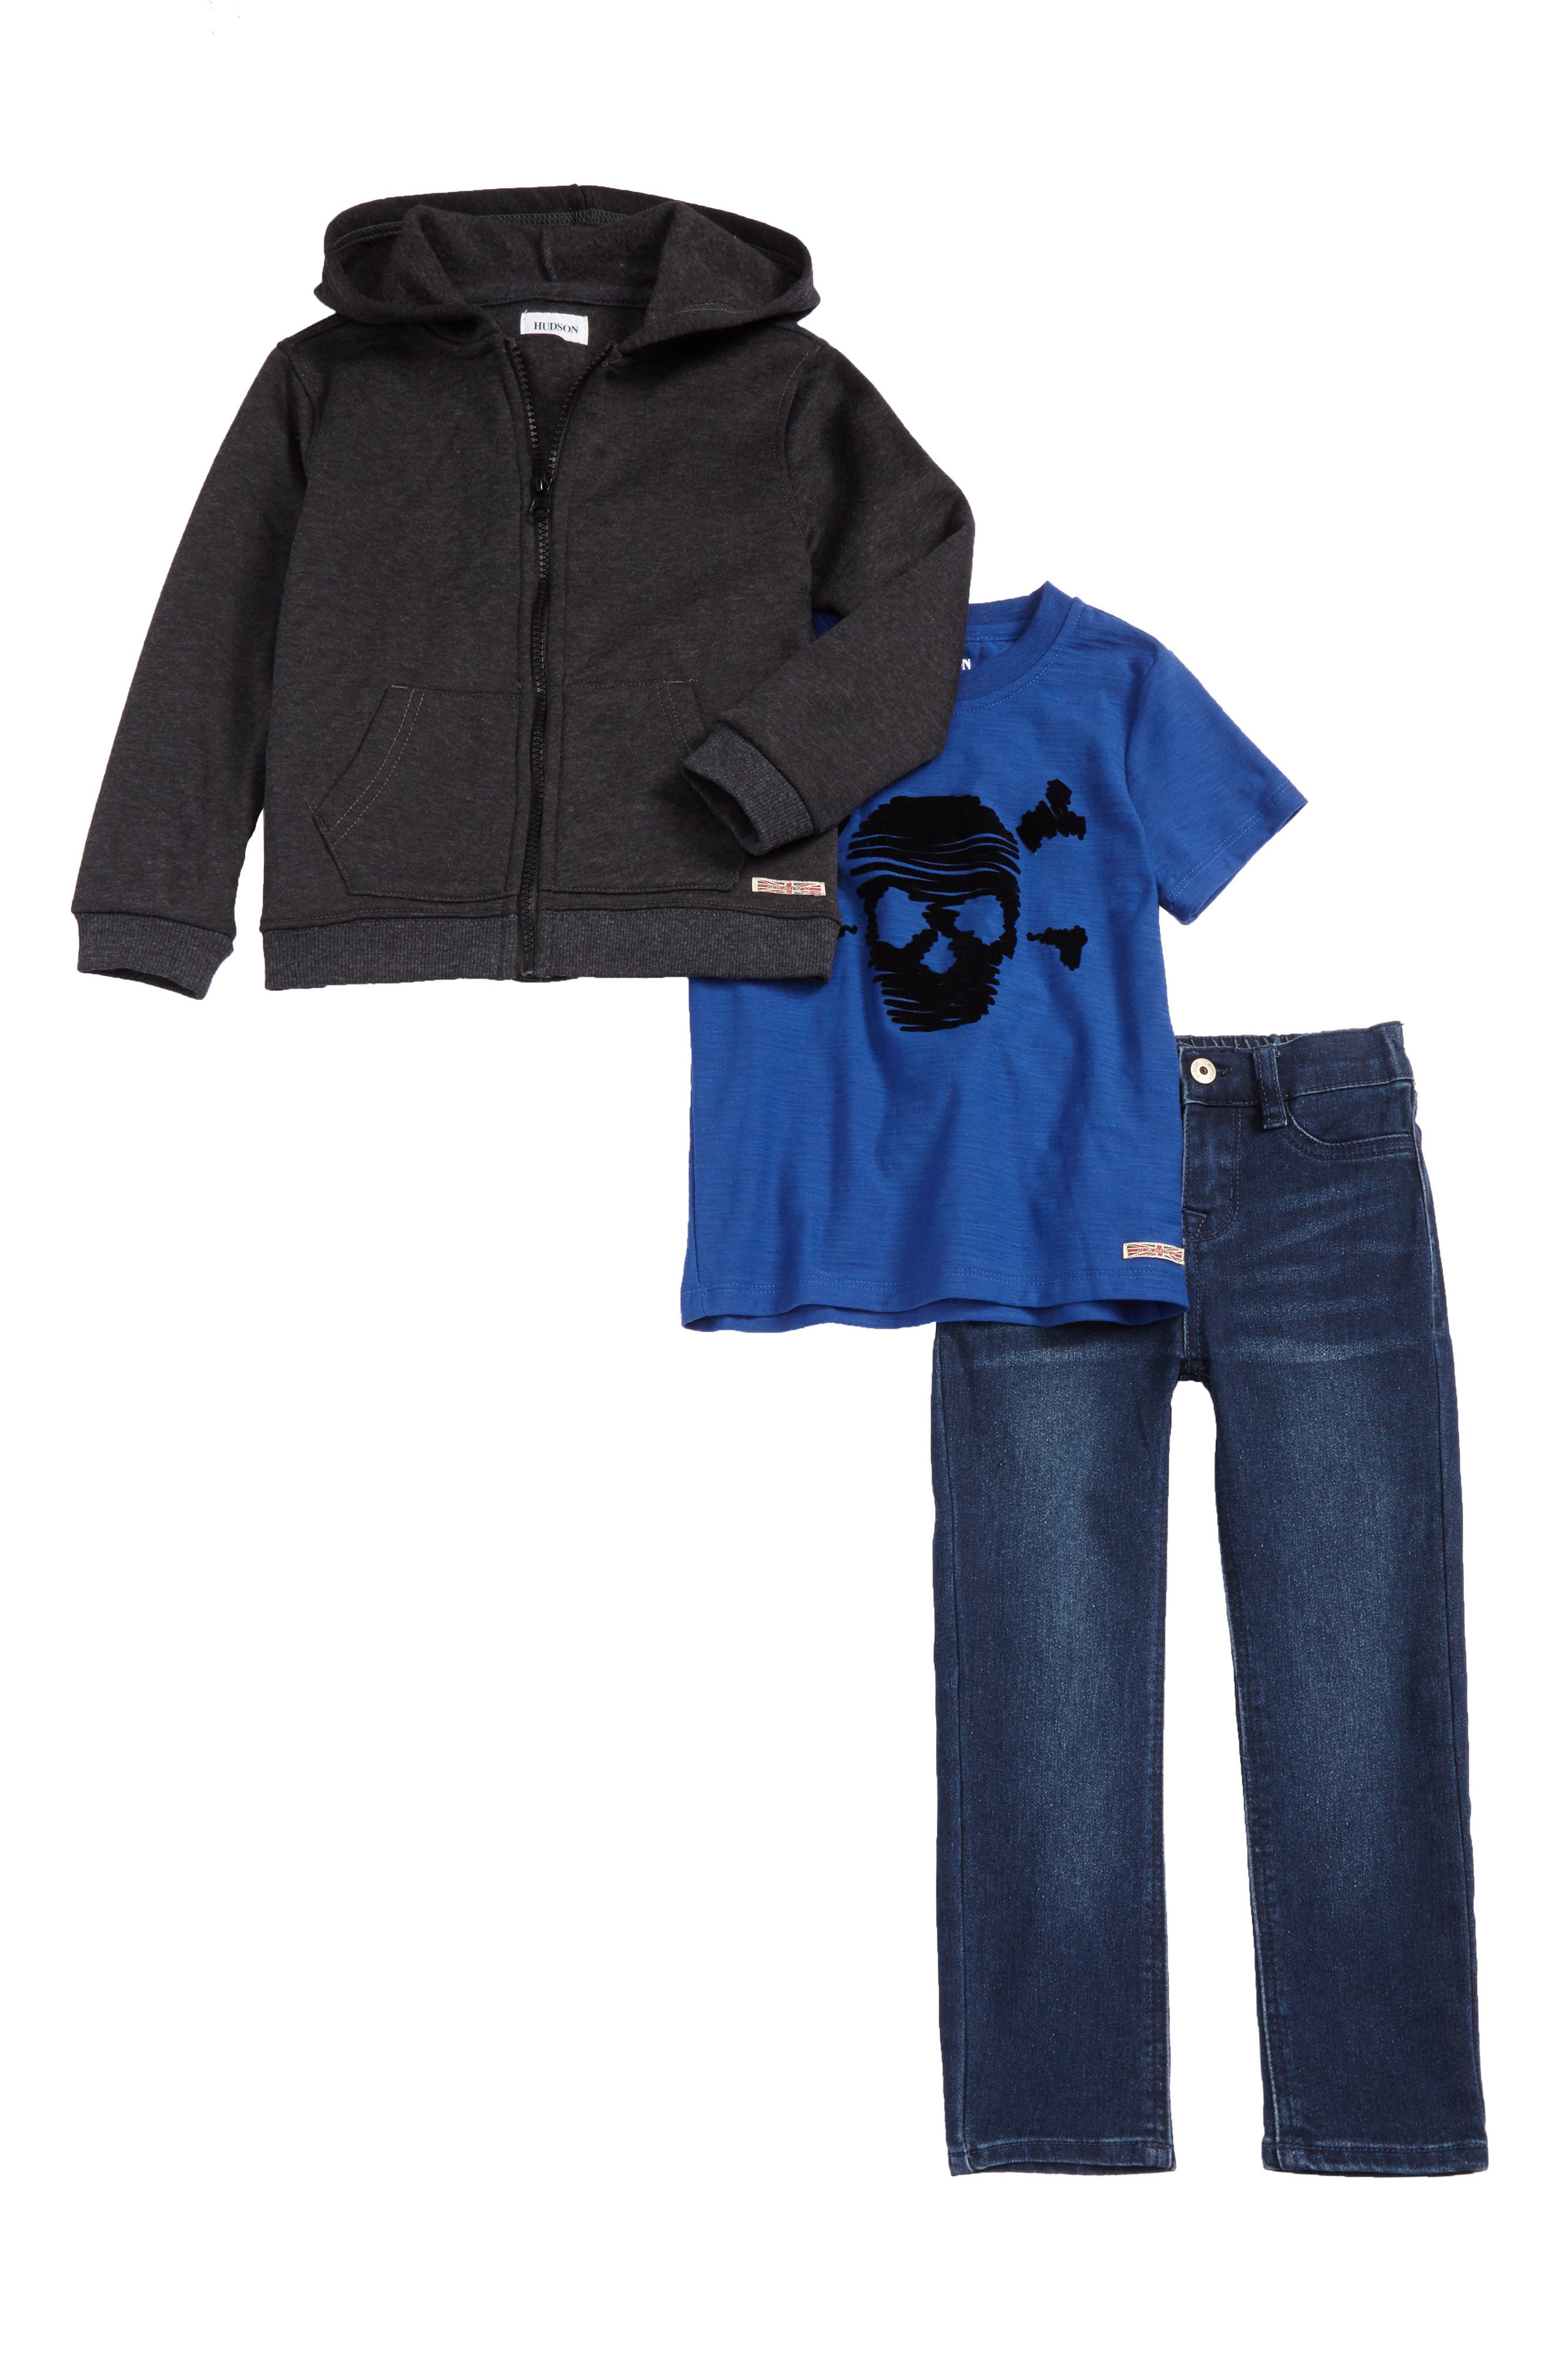 Alternate Image 1 Selected - Hudson Kids Shirt, Hoodie & Jeans Set (Toddler Boys)